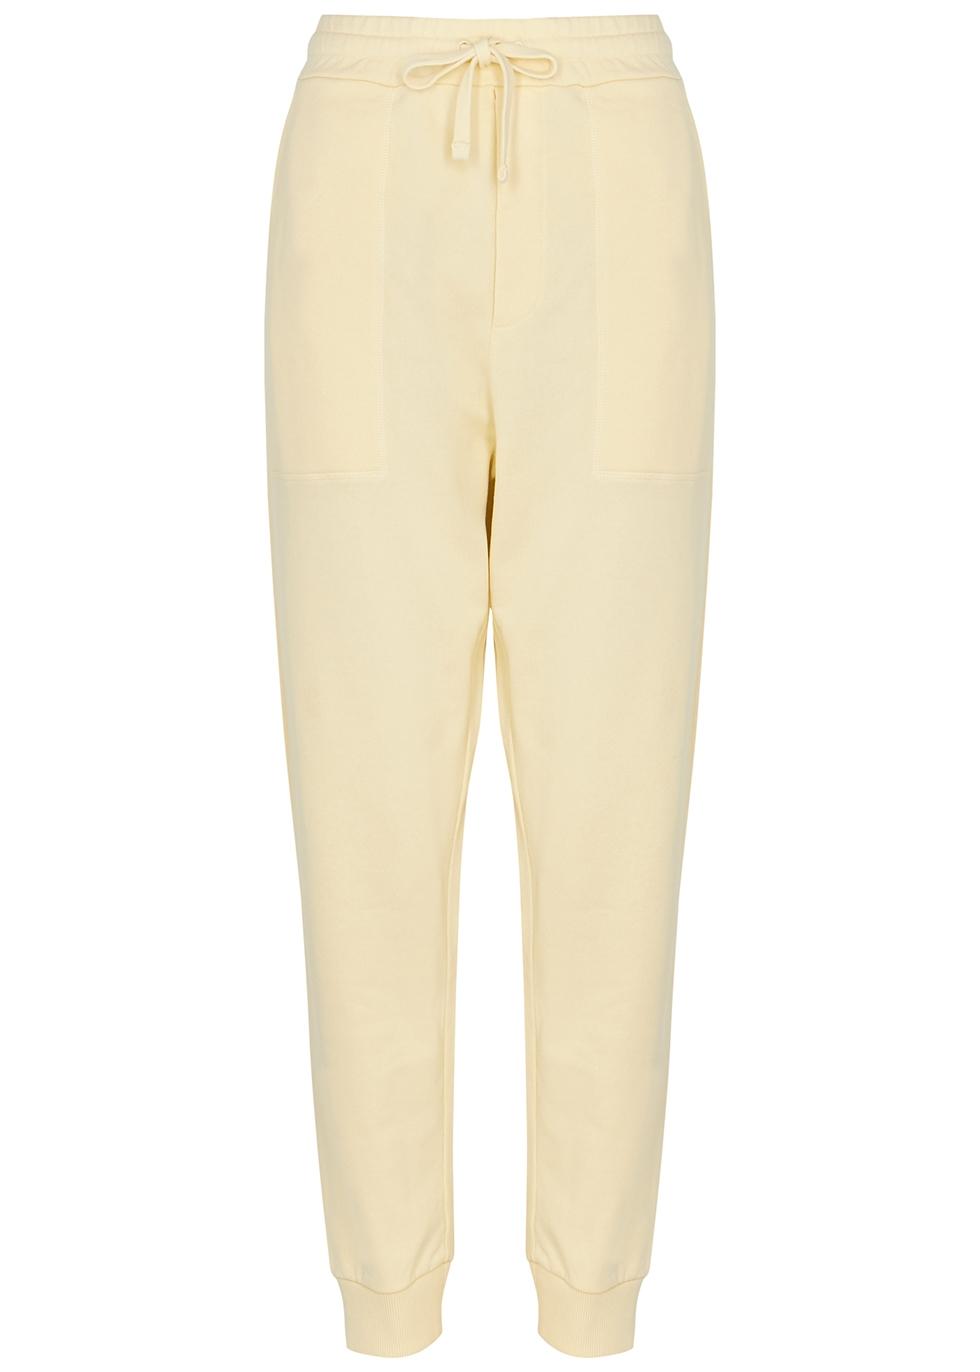 Shay cream cotton sweatpants